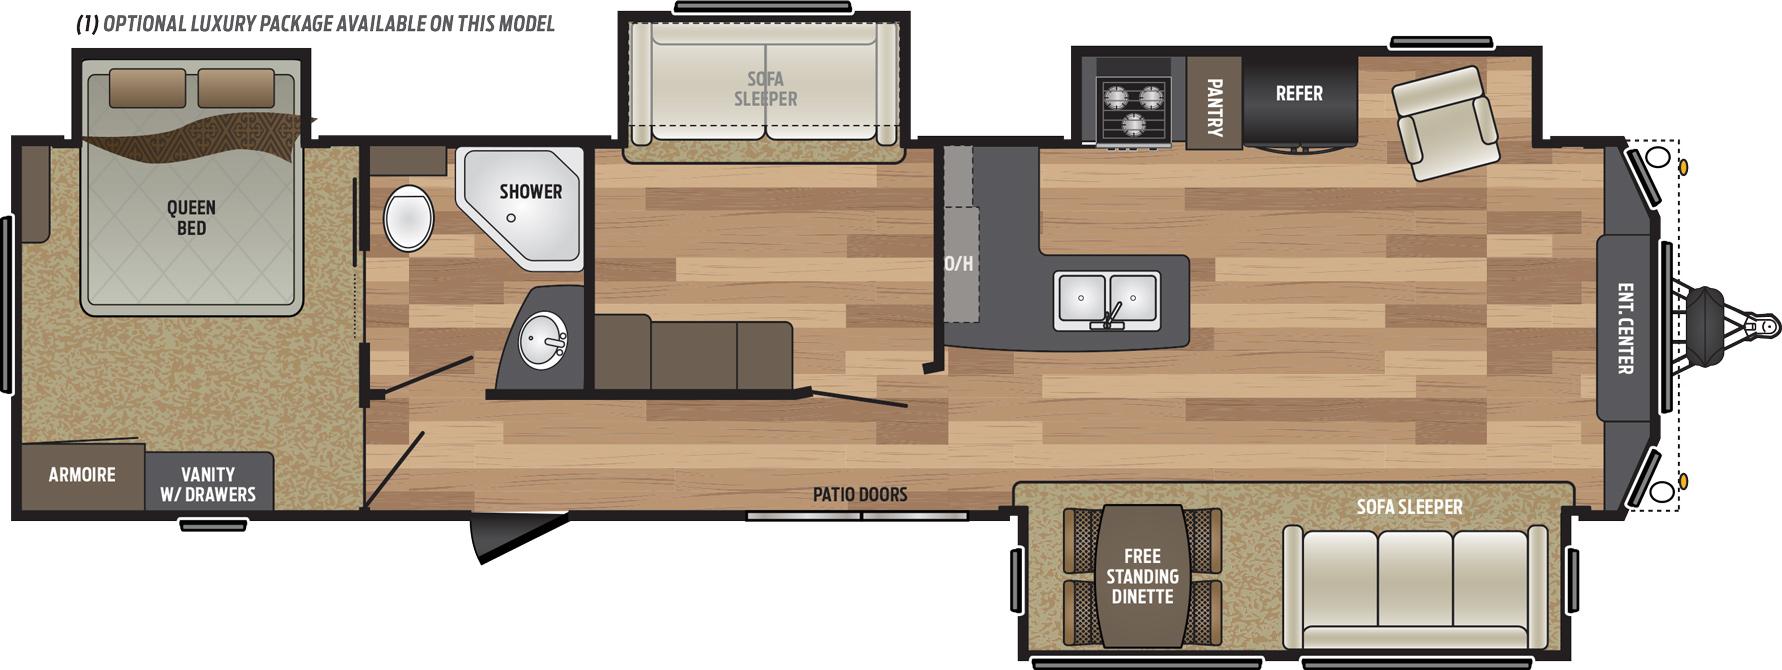 2019 KEYSTONE RETREAT 39MBNK (bunks) Floorplan